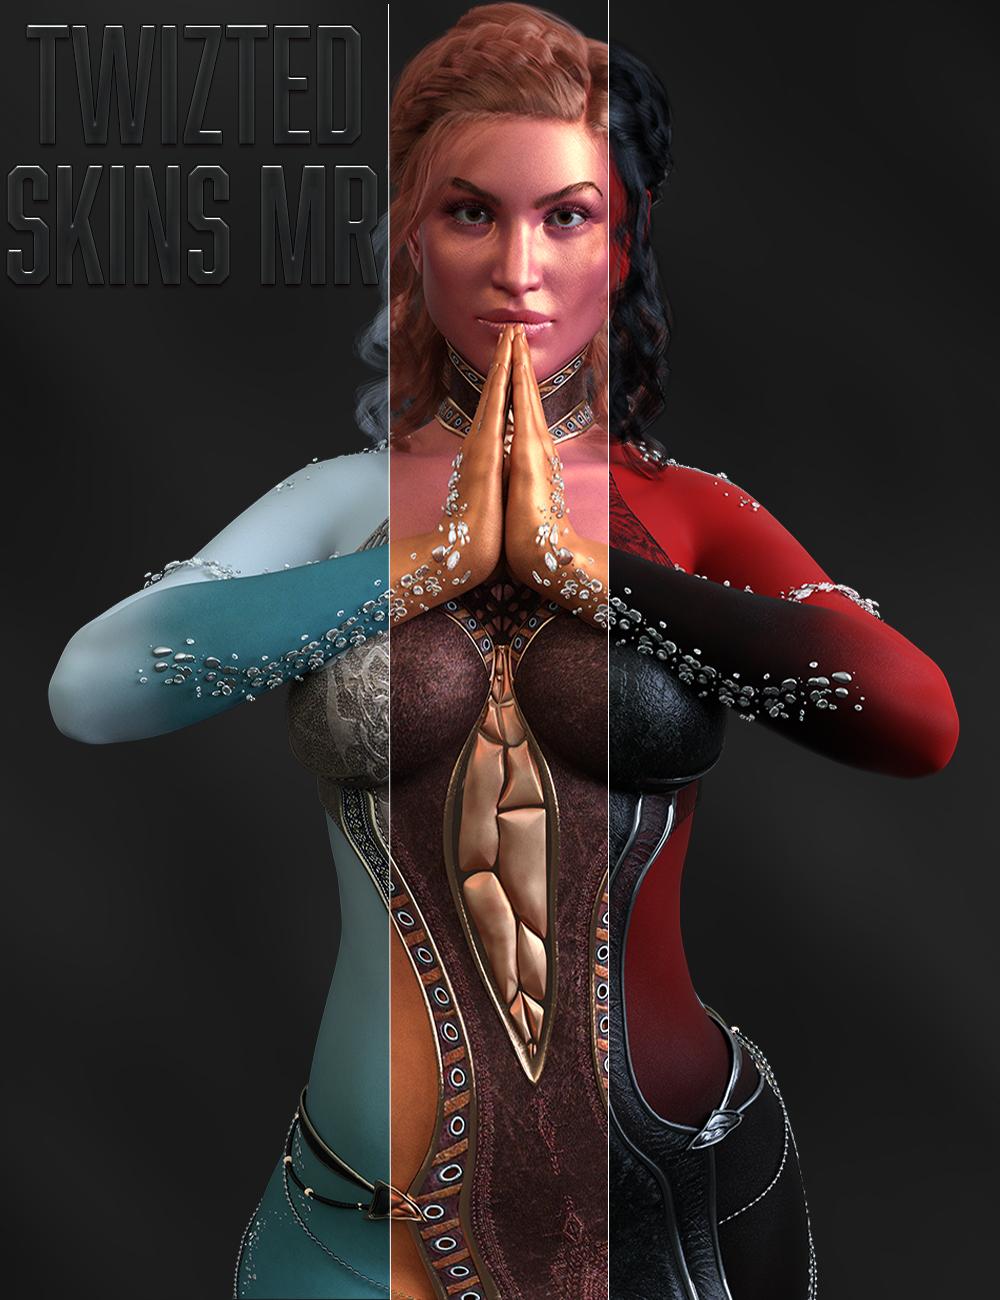 Twizted Skins Merchant Resource by: TwiztedMetal, 3D Models by Daz 3D